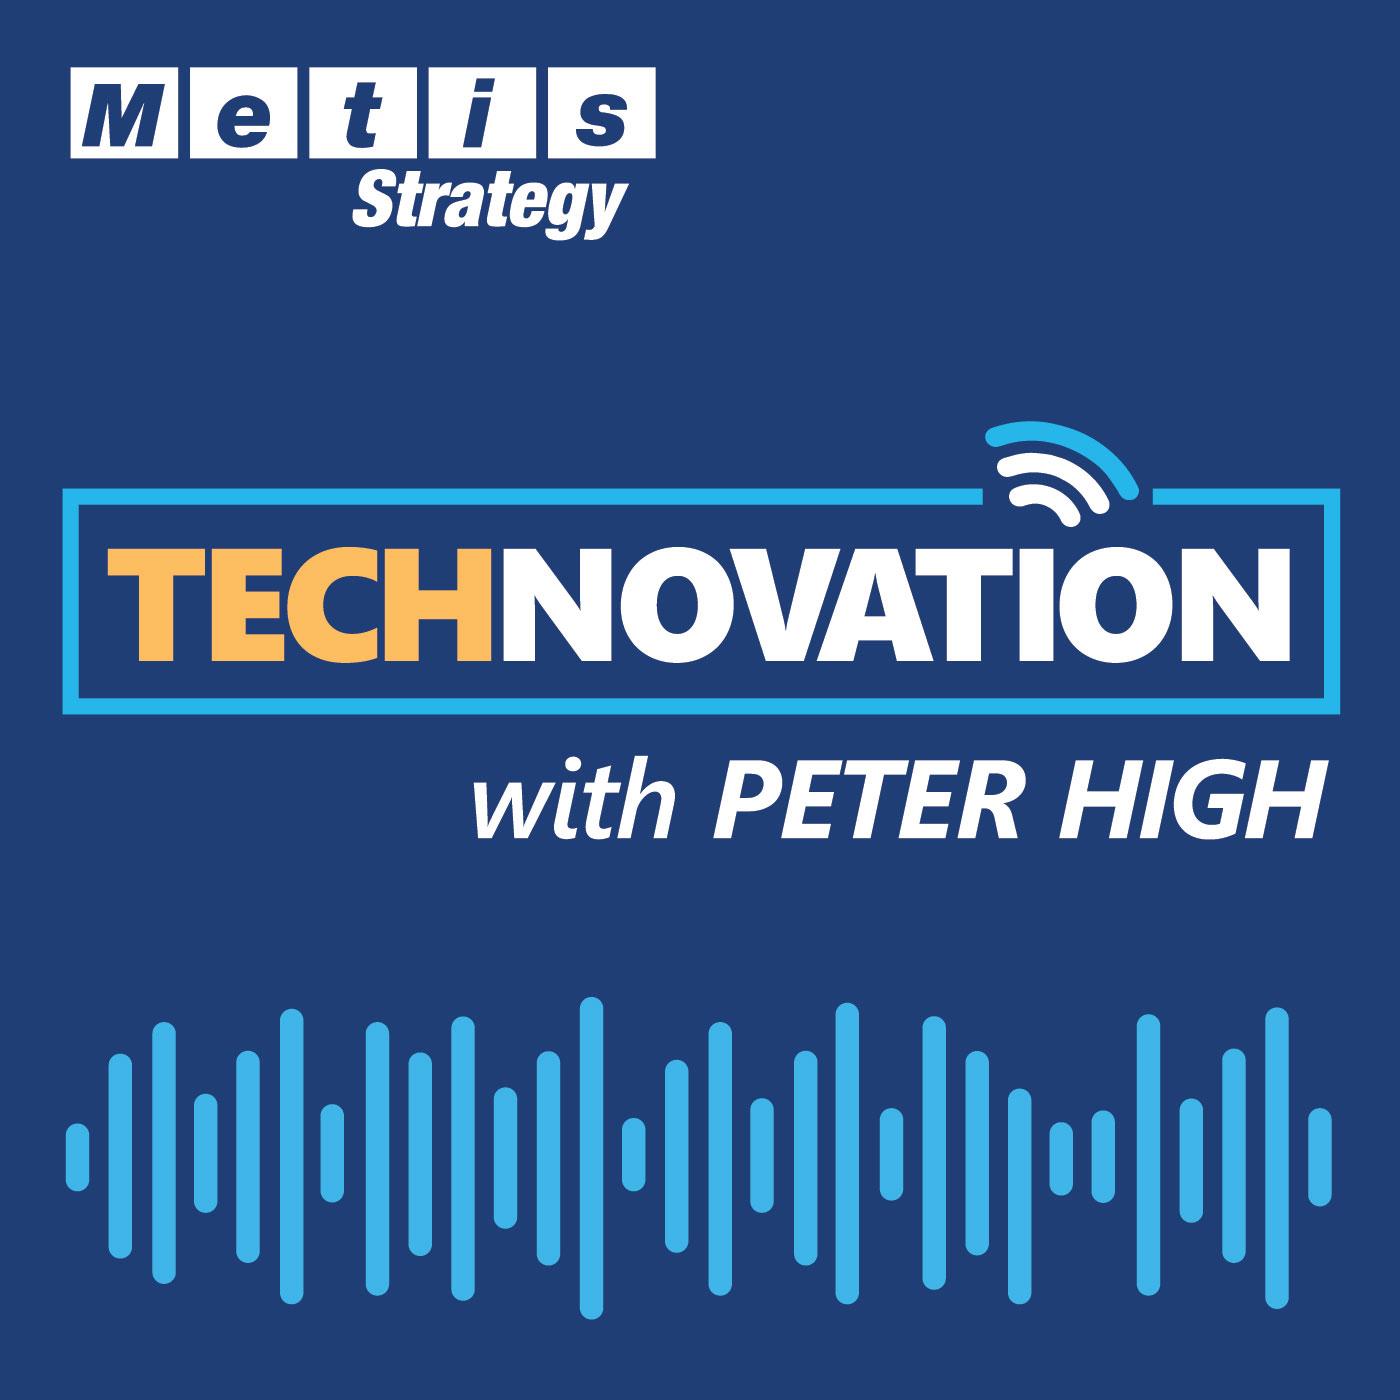 A highlight from ArcBest Technologies President Michael Newcity on Transformative Innovation